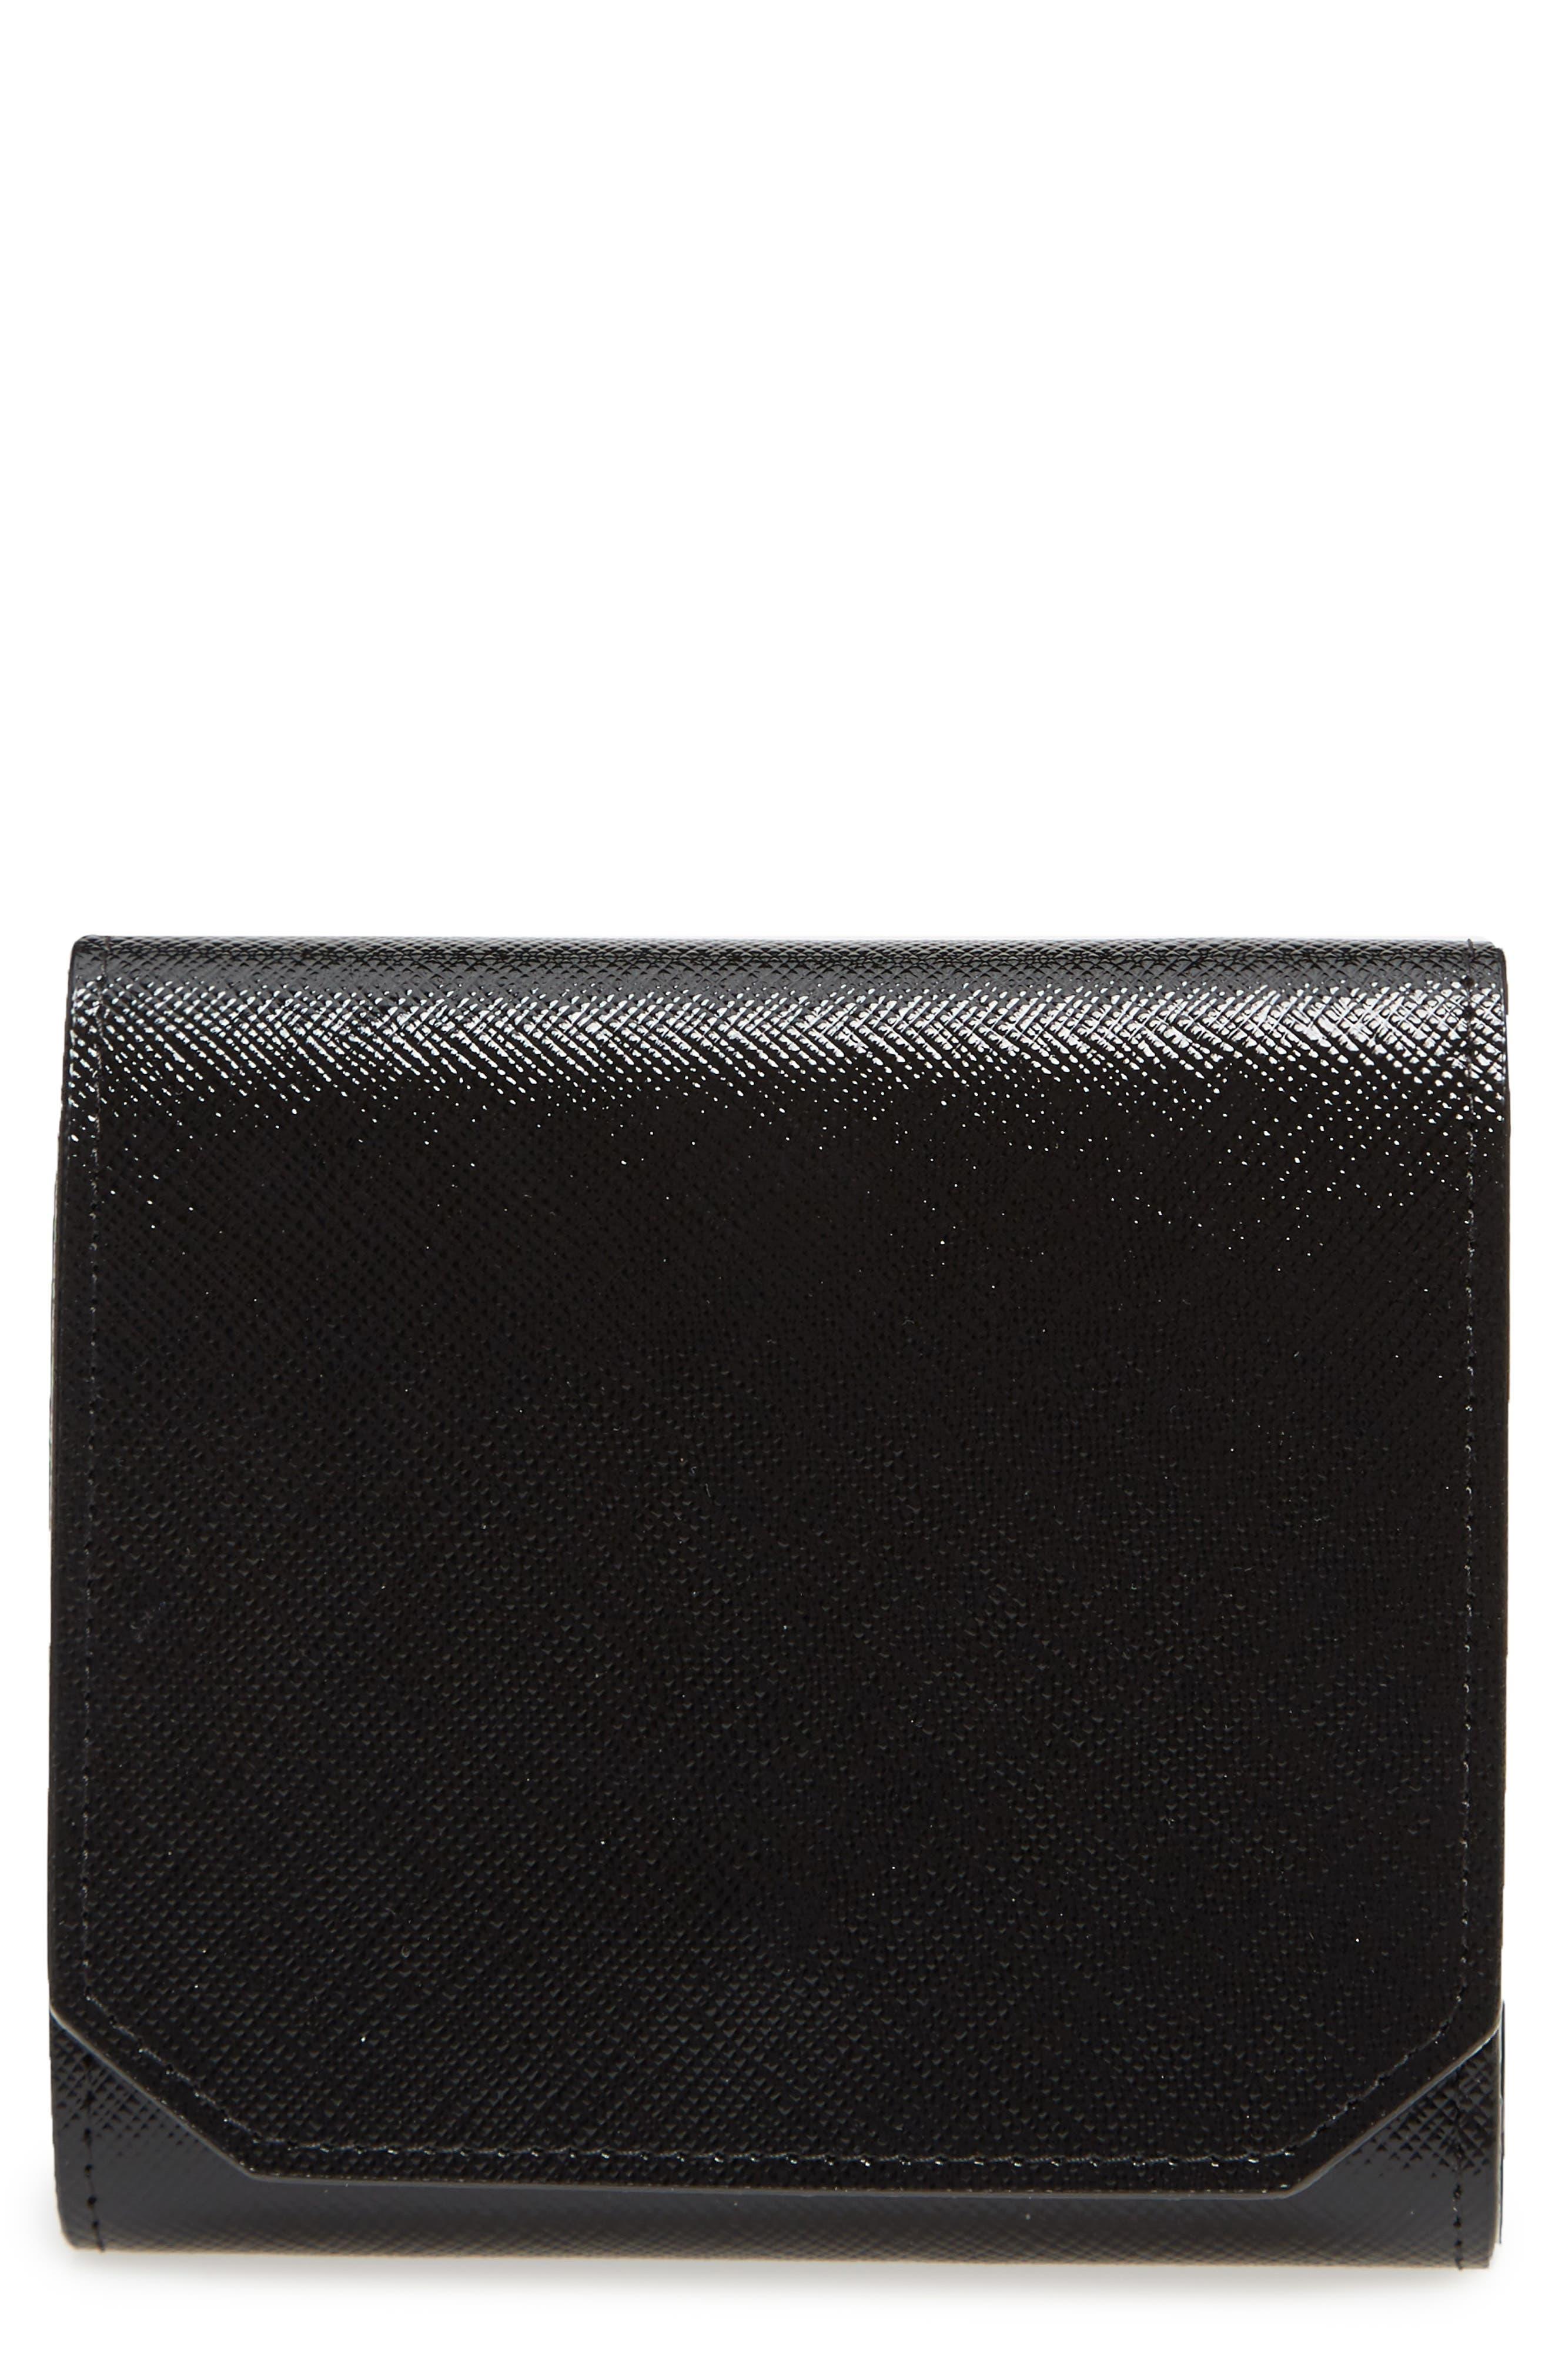 Trifold Leather Envelope Wallet,                             Main thumbnail 1, color,                             Black